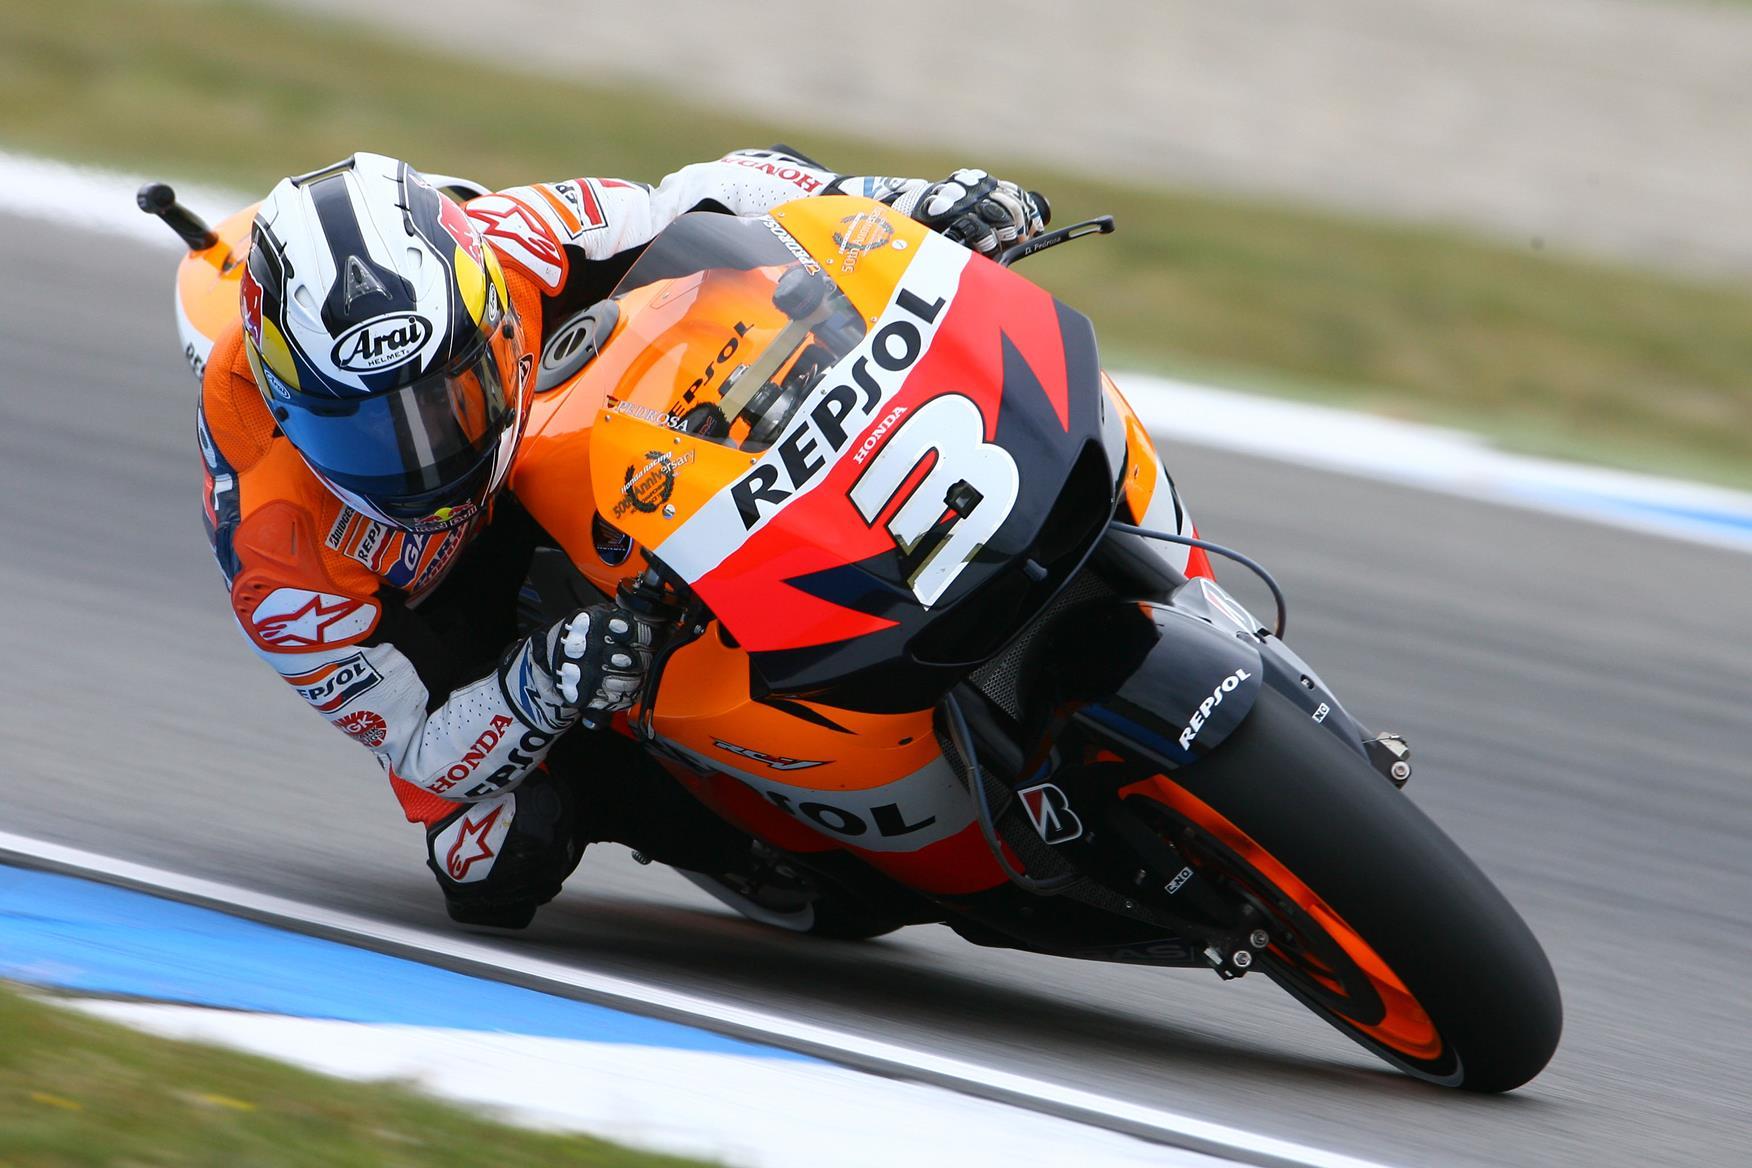 Read more about the Spanish rider on the Dani Pedrosa bio page..